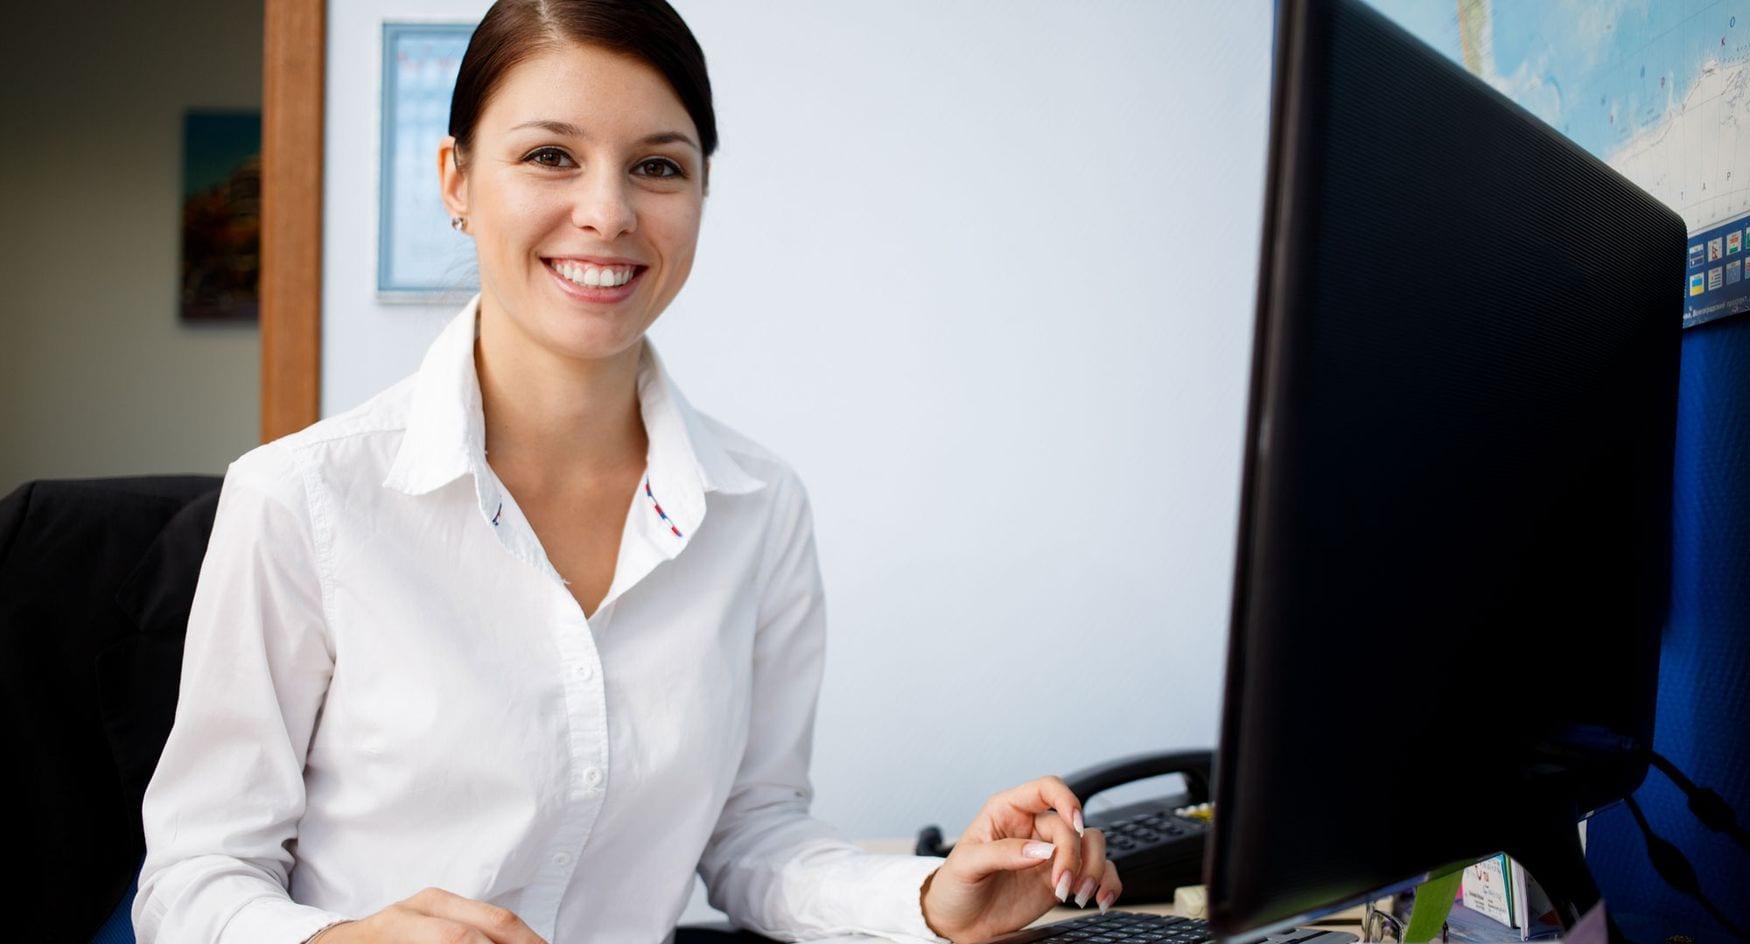 Medical_Billing_Interview_Preparation_Part_1